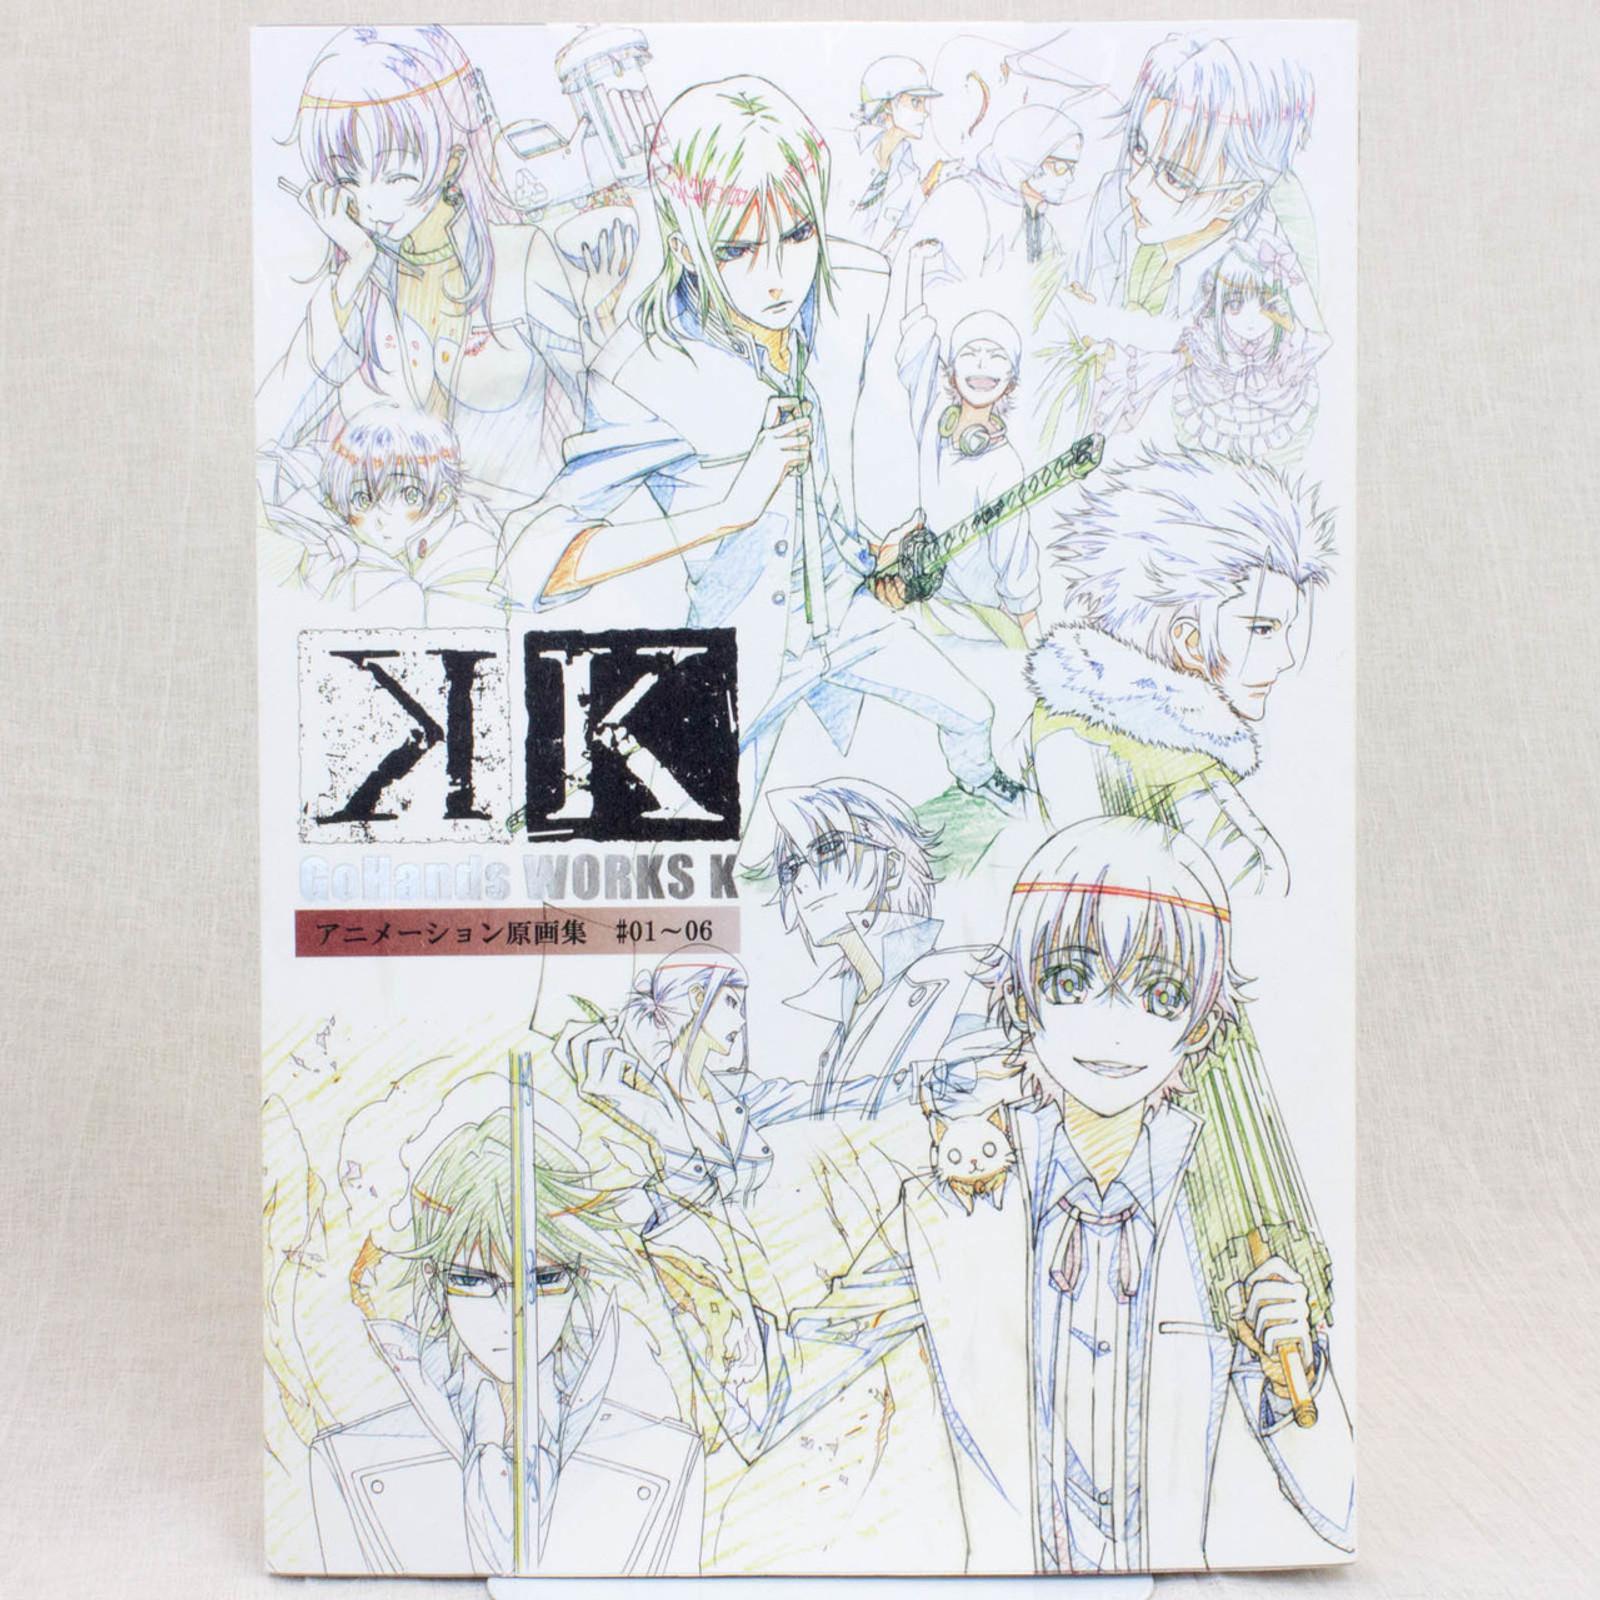 GoHands WORKS [K] Project Original Sketches Art Book #01-06 JAPAN ANIME MANGA